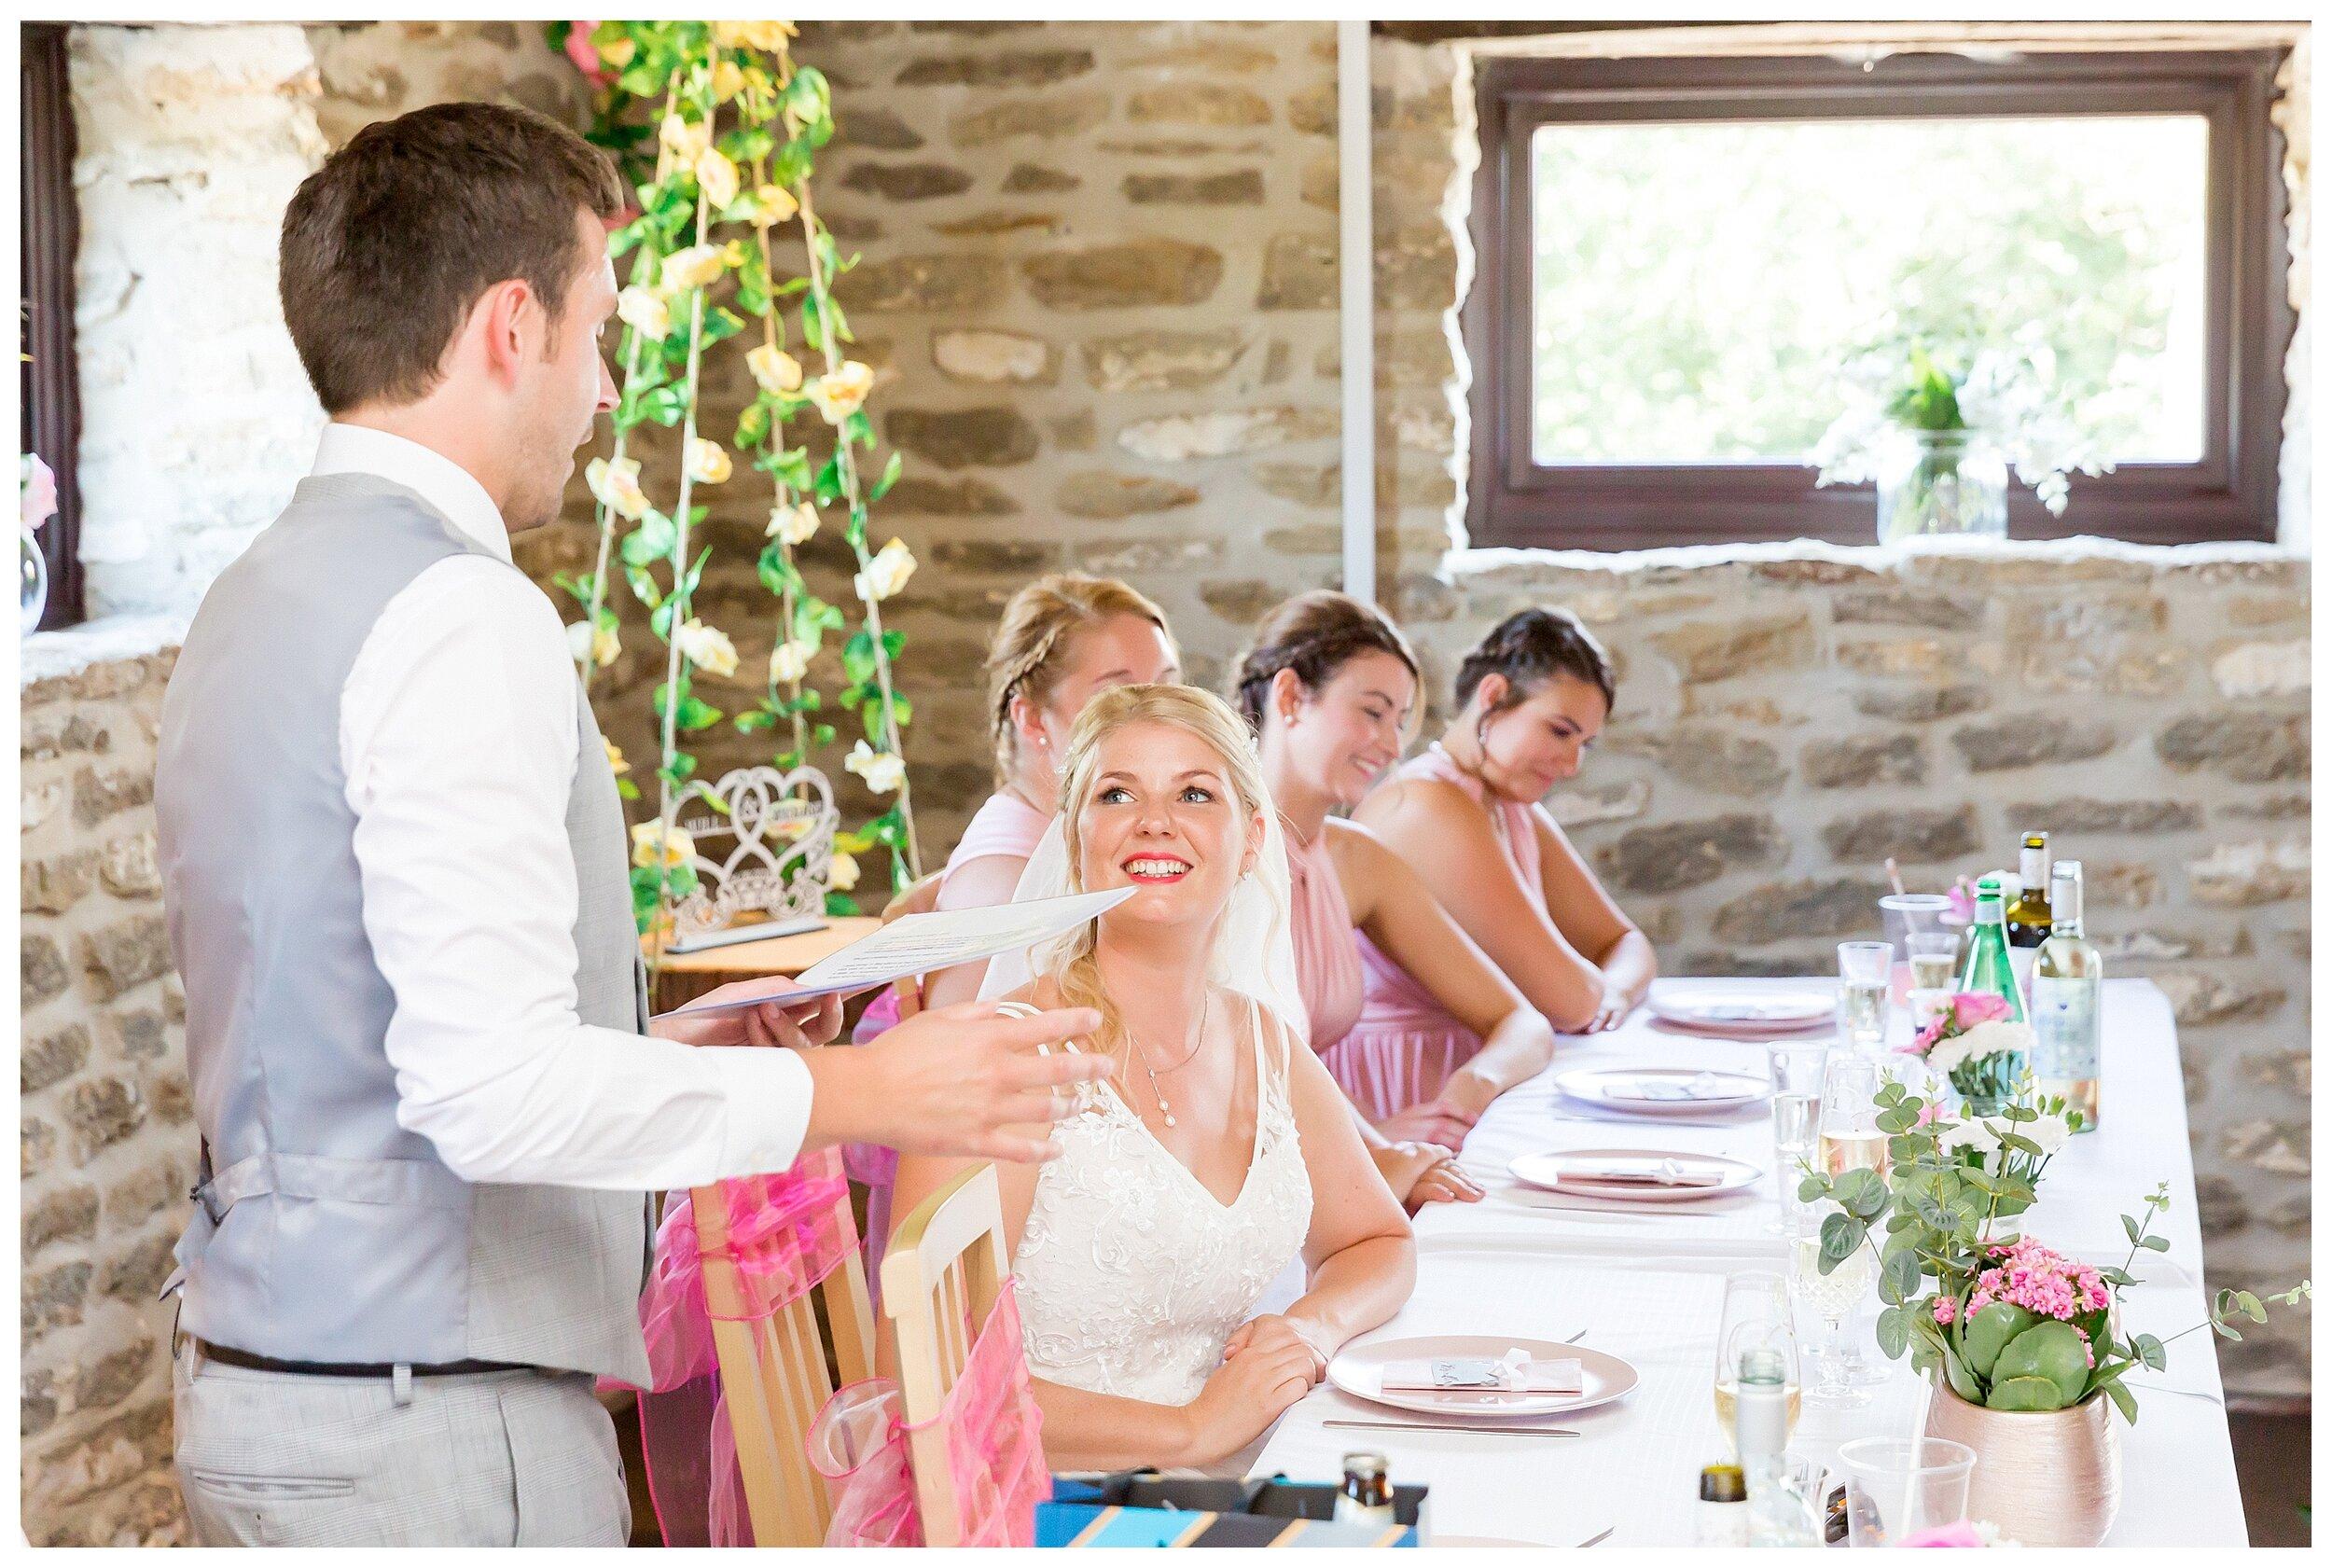 wedding venue ideas somerset.jpg